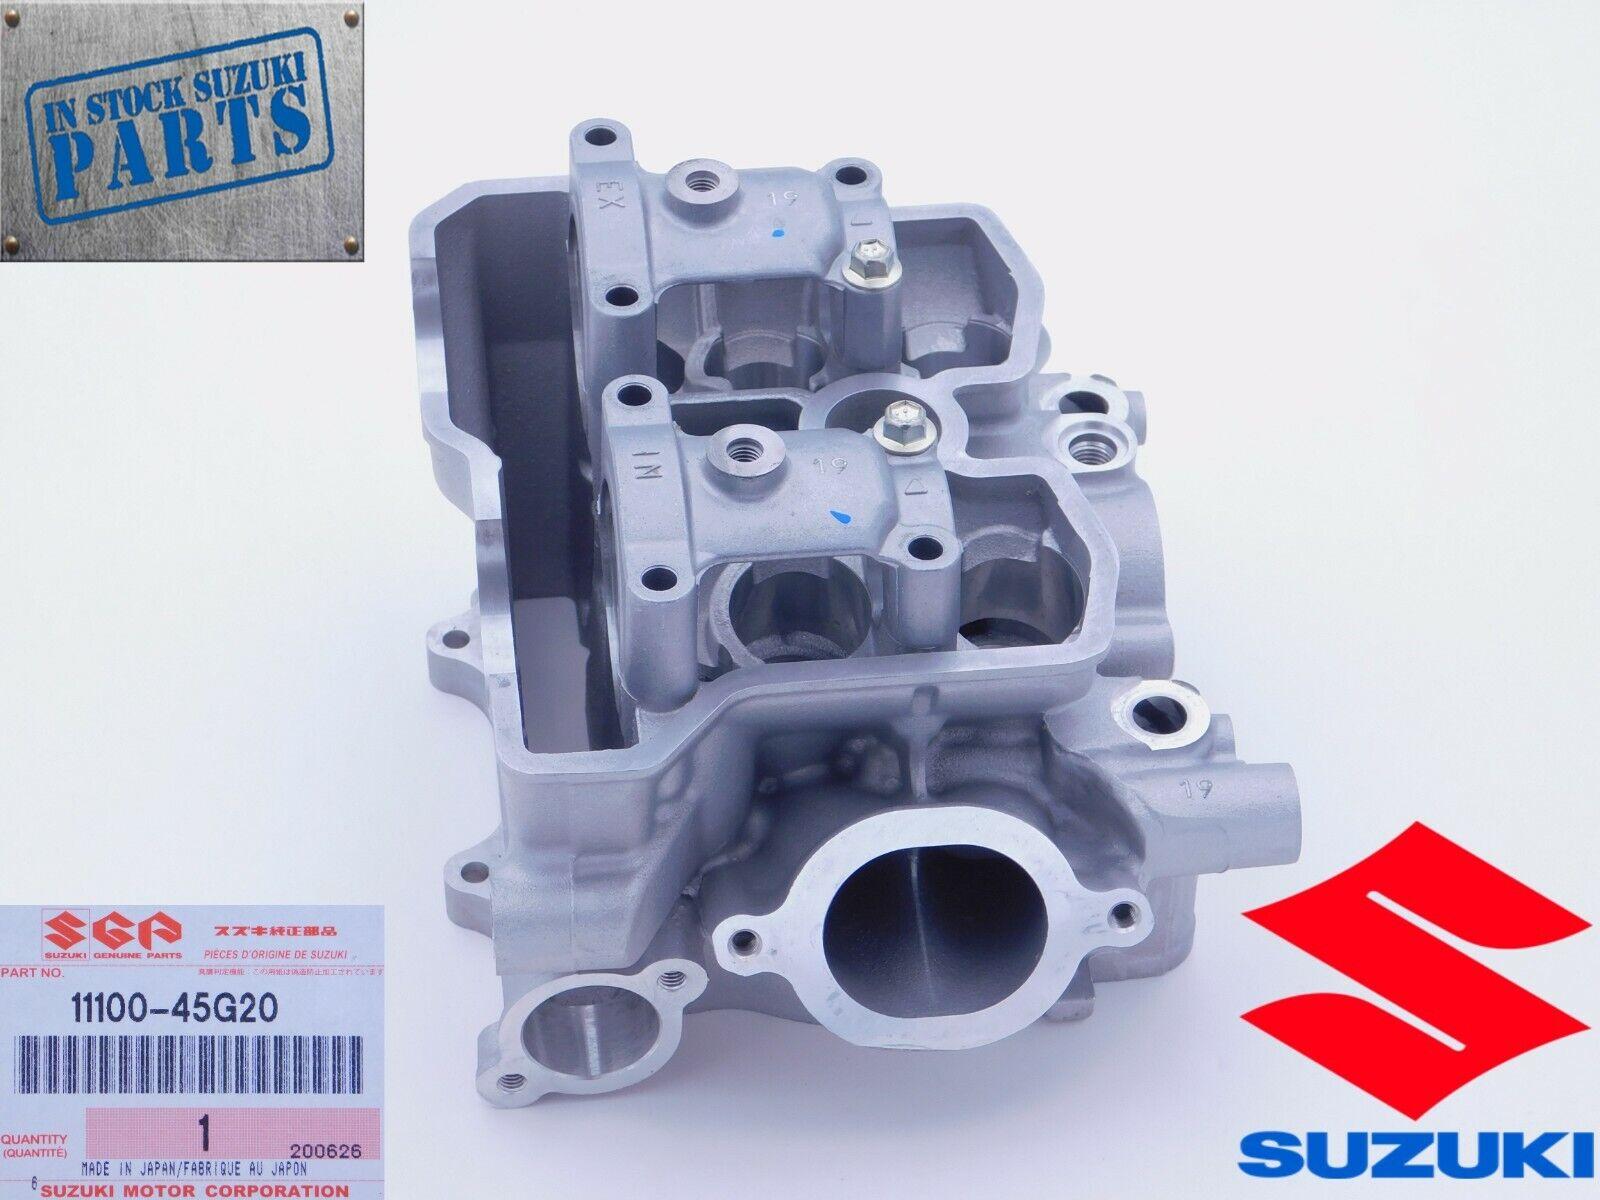 Pressure Radiator Cap 1.6 Suzuki Ltr 450 Lt 250 500 1985-2009 motor engine